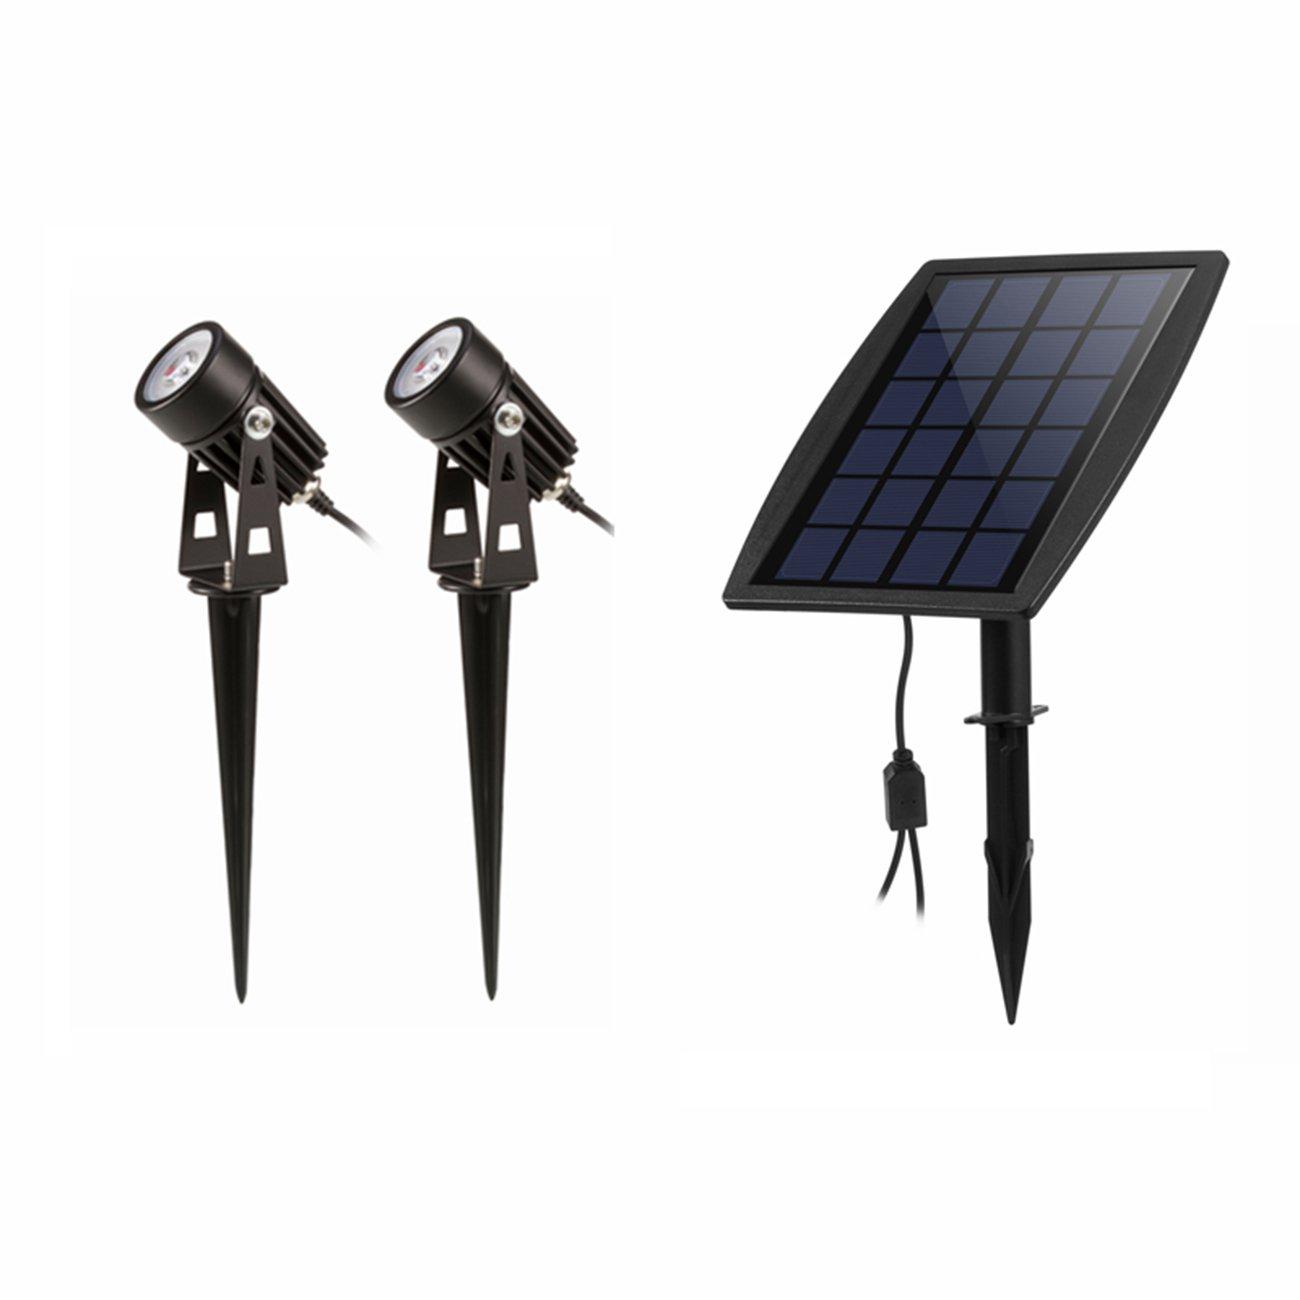 LED Landscape Solar lights Waterproof Outdoor Solar Spotlight for Backyard Driveway Patio Gardens Lawn,Dusk to Dawn Auto On Off (3000K-Warm White)